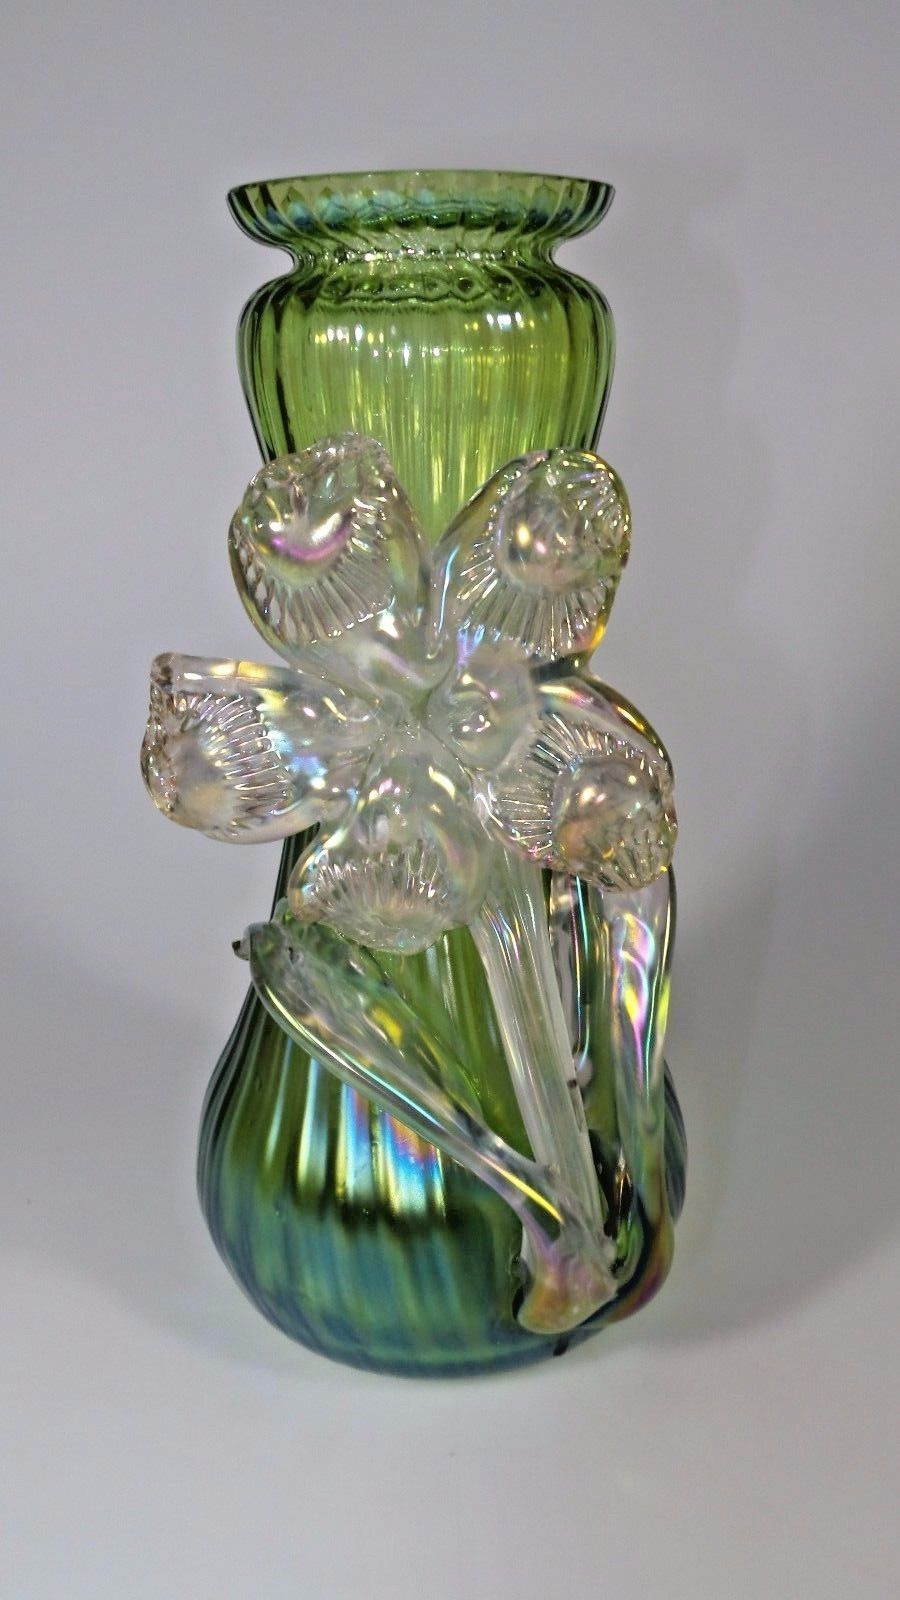 Small Vintage Glass Vases Of Vintage Blown Glass Vase Gallery Antique Glass Living Room Crystal with Vintage Blown Glass Vase Pictures Vintage Art Nouveau Kralik Green Iridescent Art Glass Vase W Applied